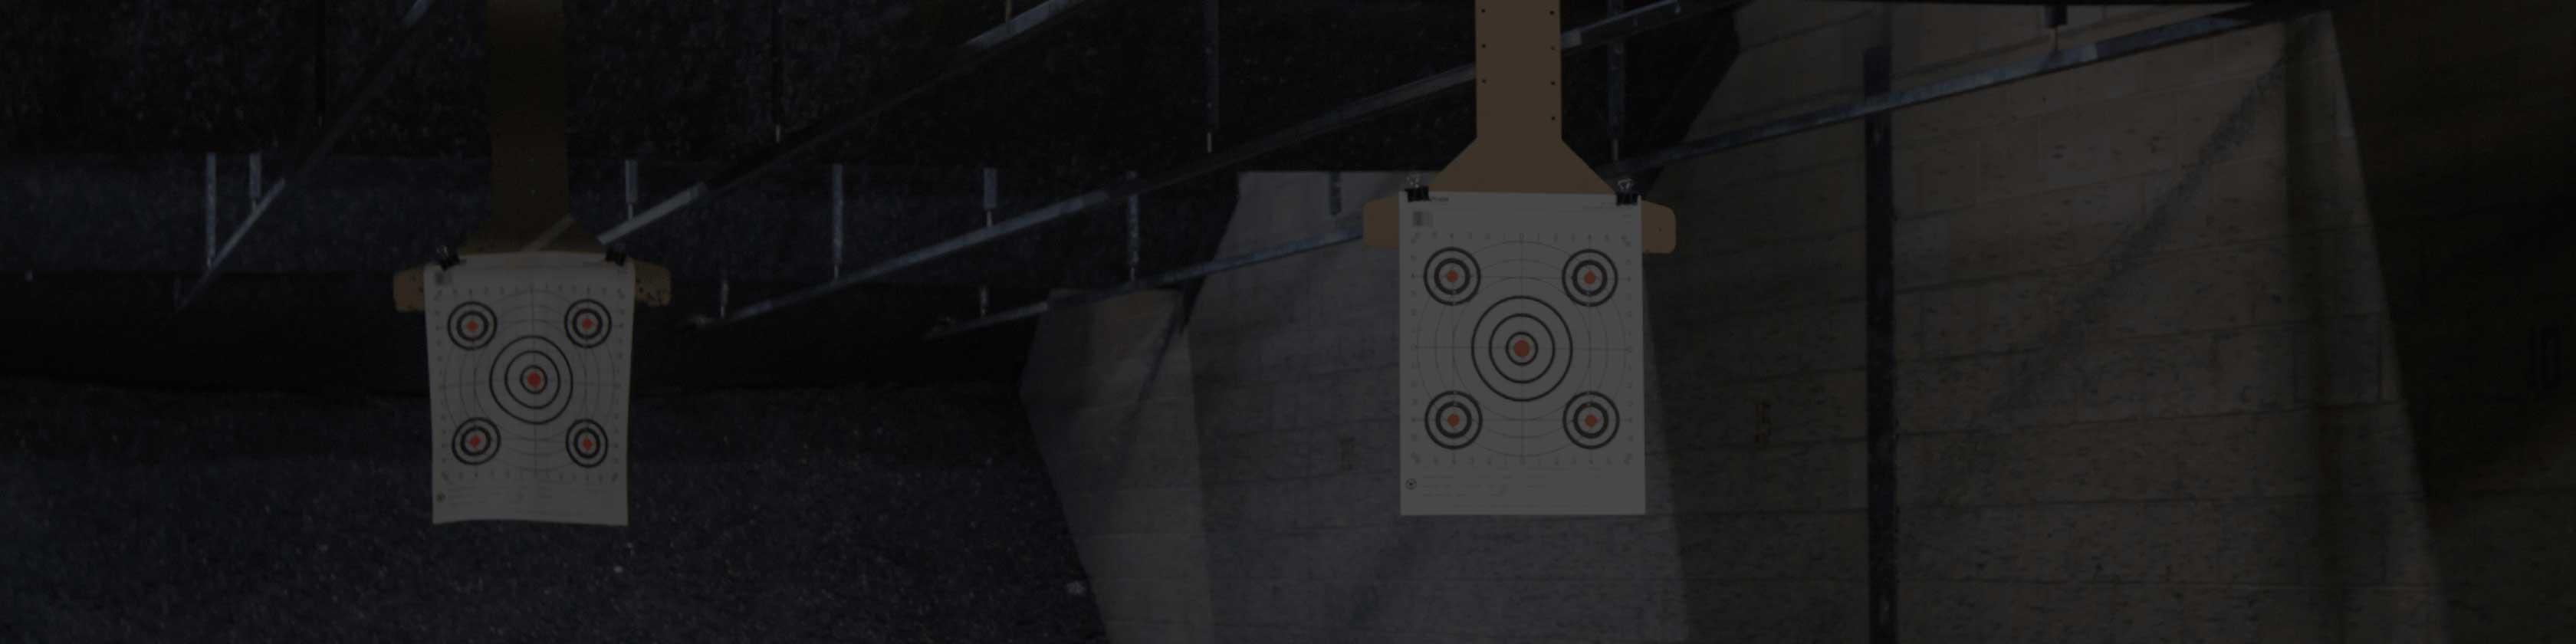 Stock up on 9mm ammunition-close up of ammo